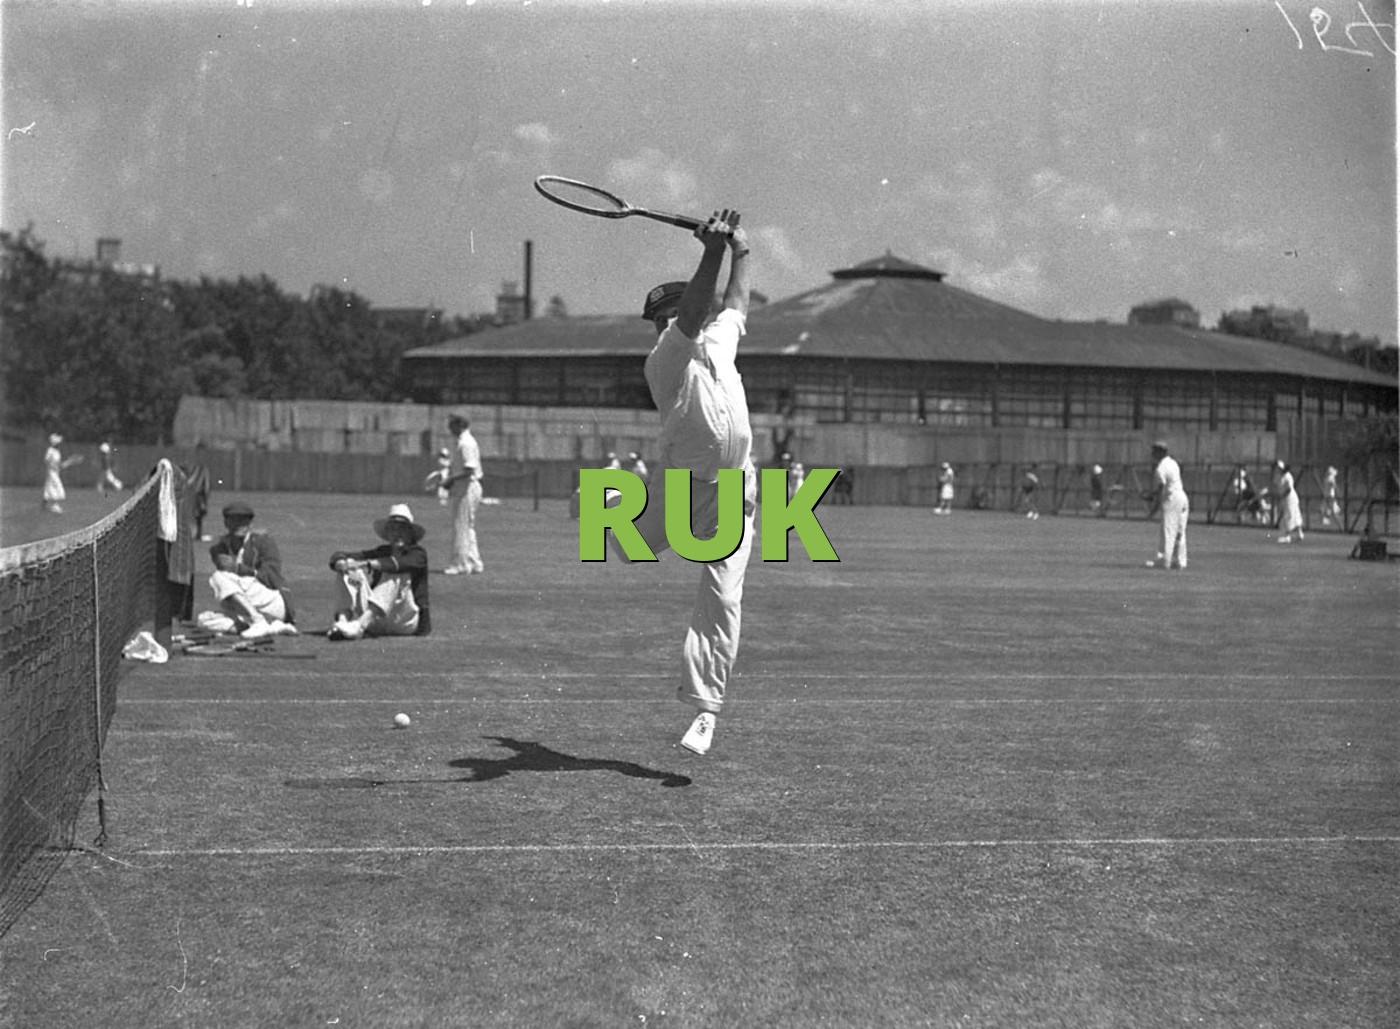 RUK » What does RUK mean? » Slang org